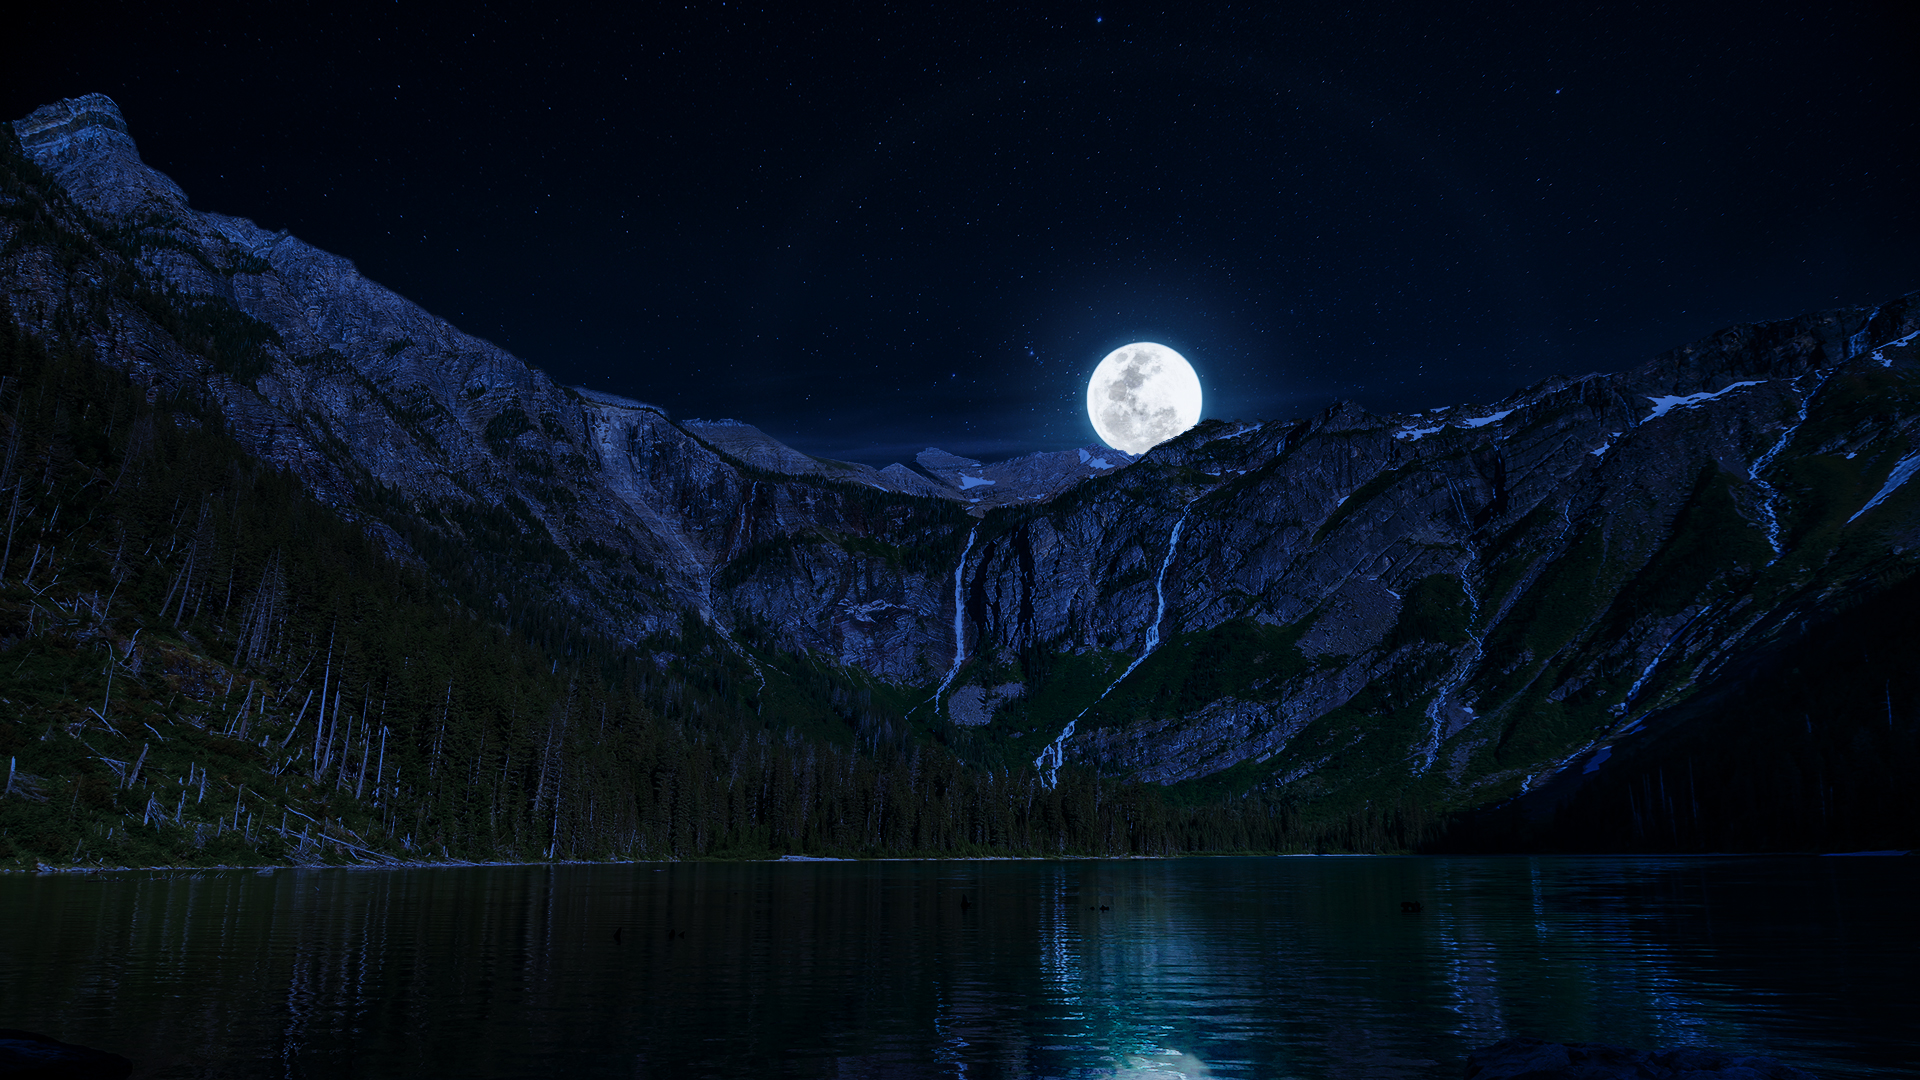 Lake Night Moon Mountains wallpaper background 1920x1080